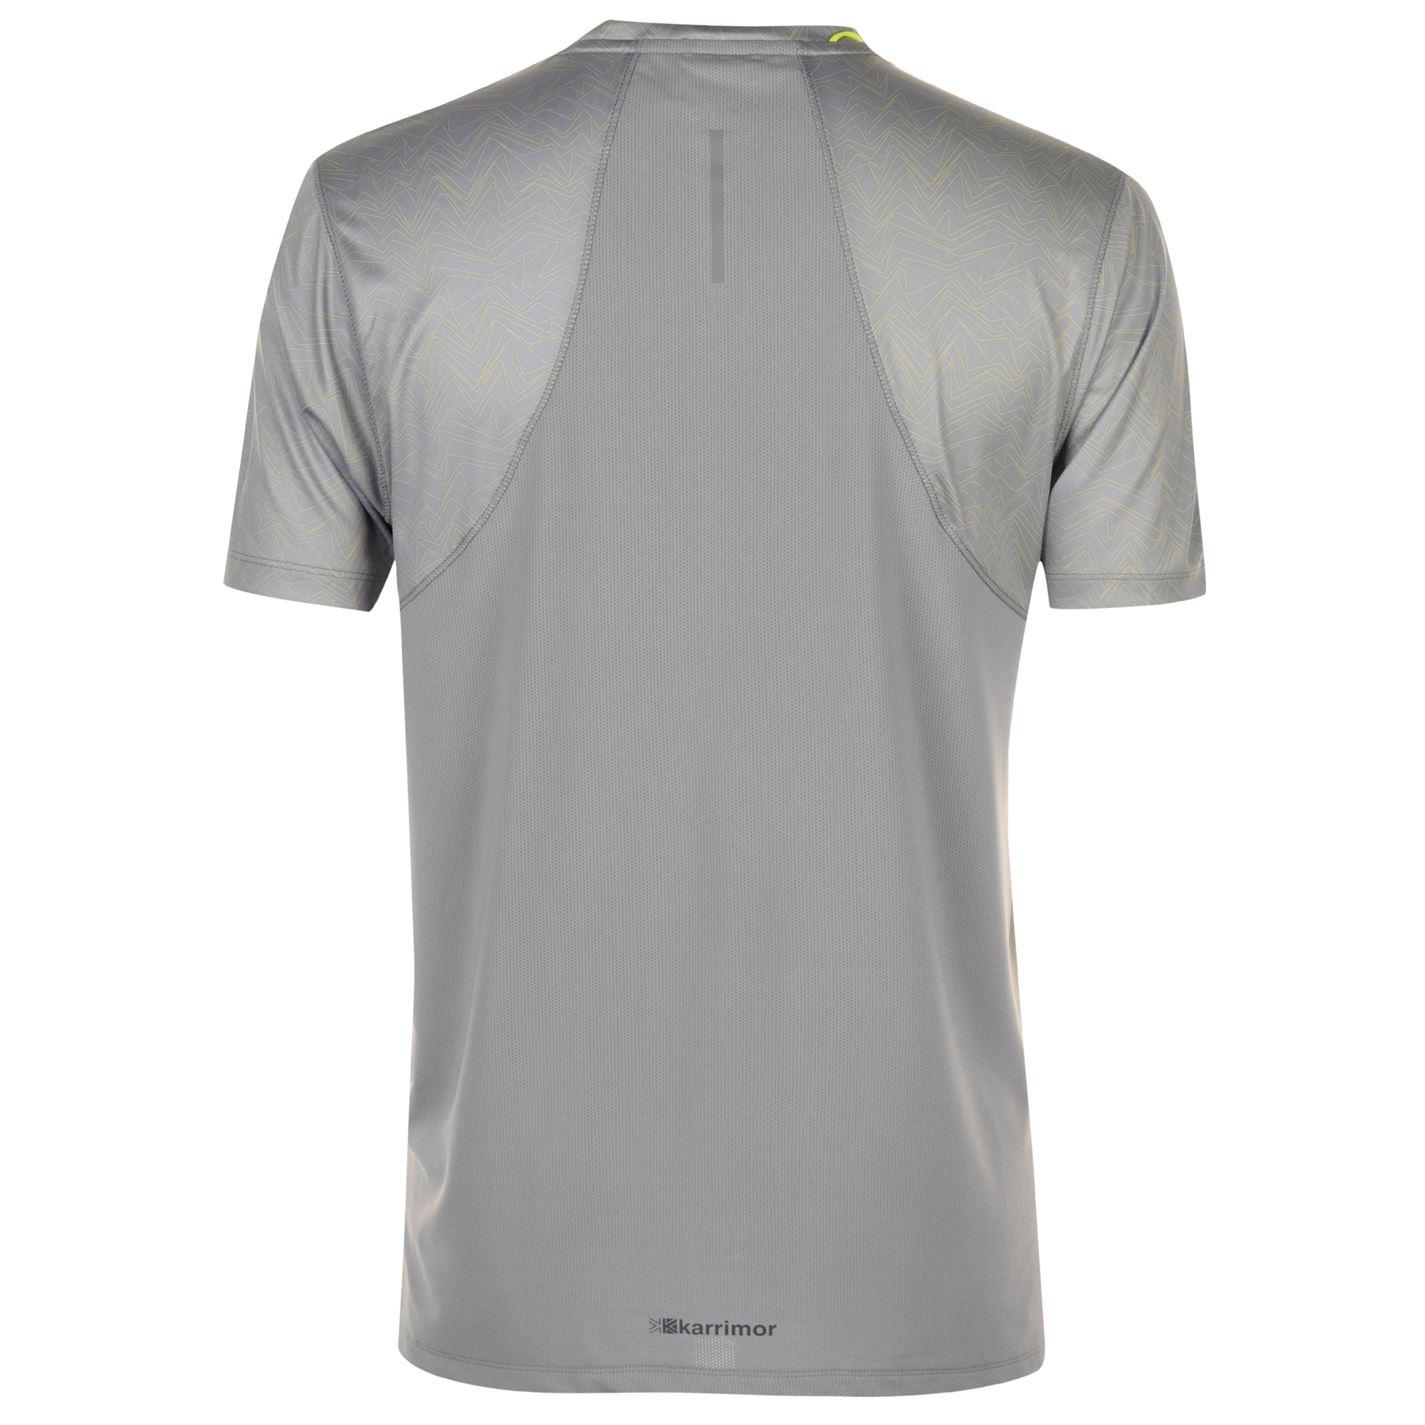 Karrimor-Hombres-X-Lite-Camiseta-mangas-cortas-de-carrera-Rendimiento-Camiseta-Top-Cuello-Redondo miniatura 7